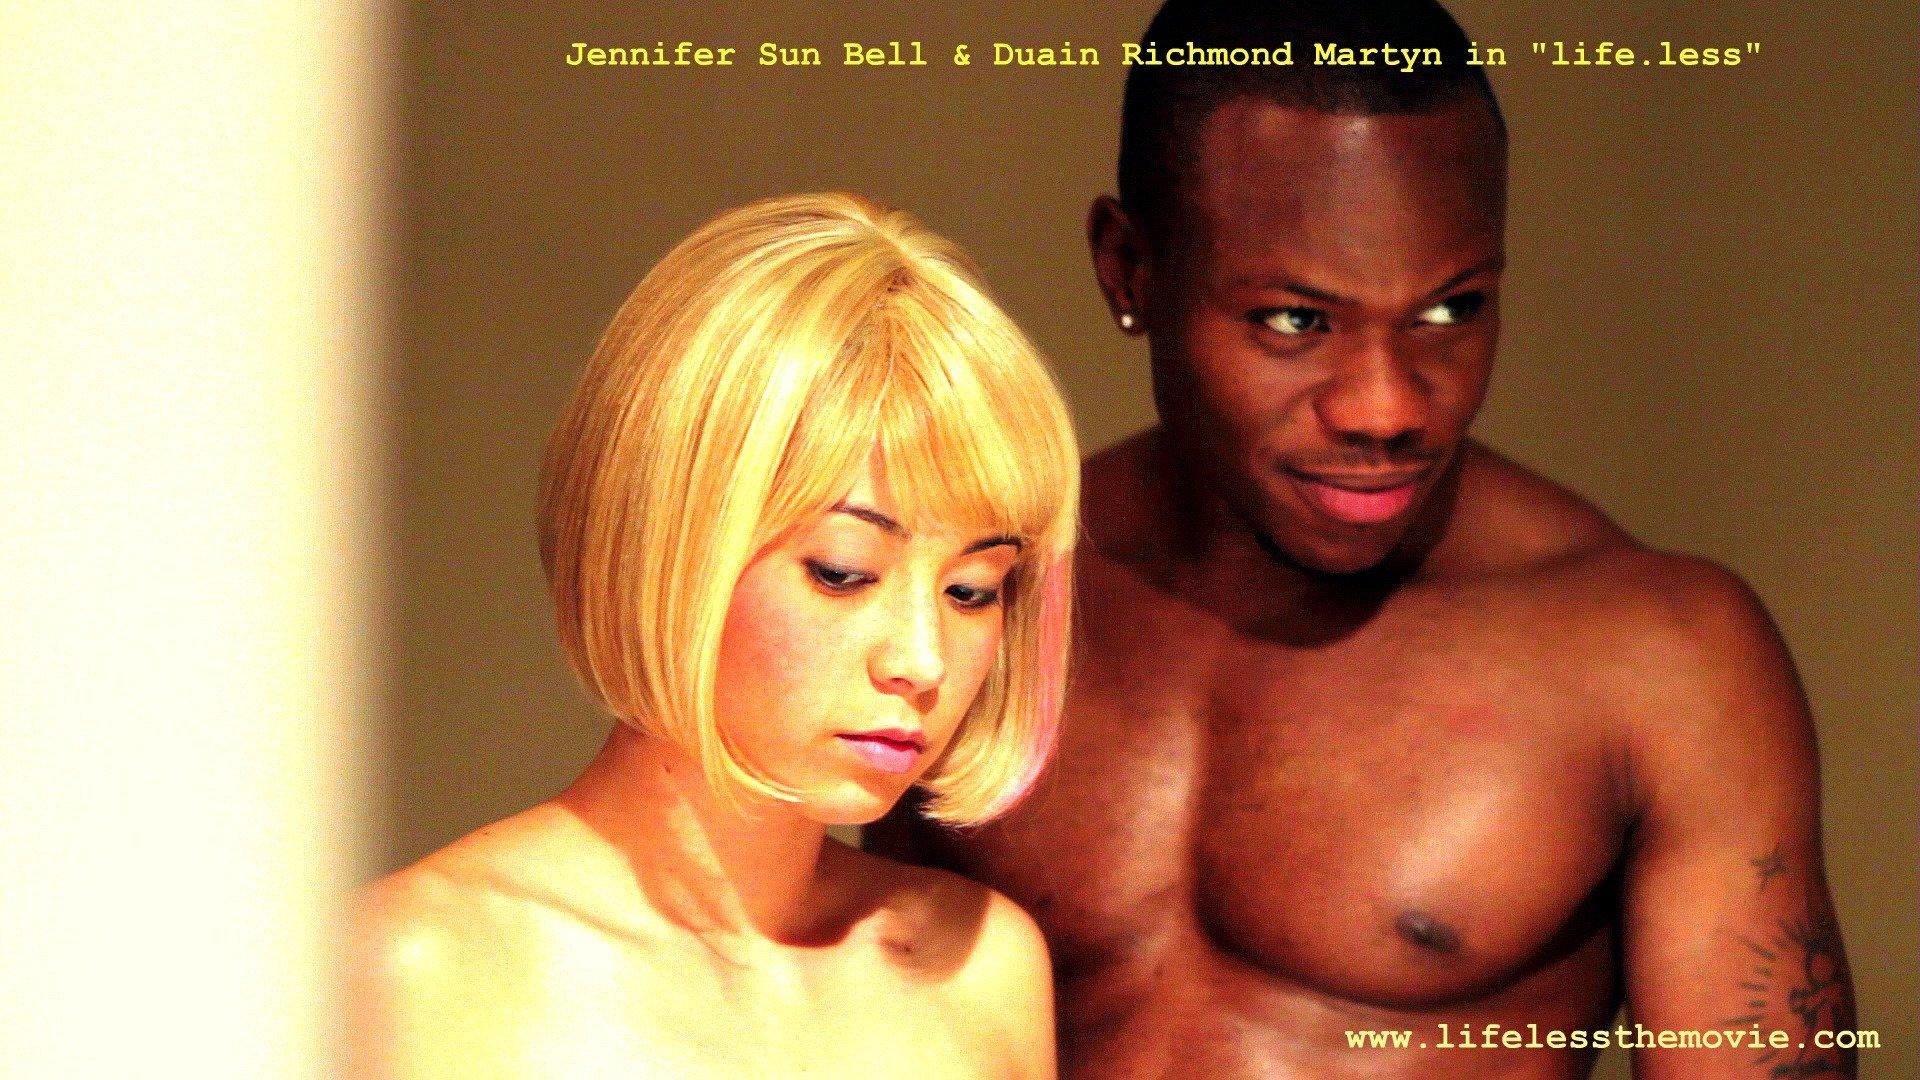 Duain Richmond and Jennifer Sun Bell in Life.less (2011)